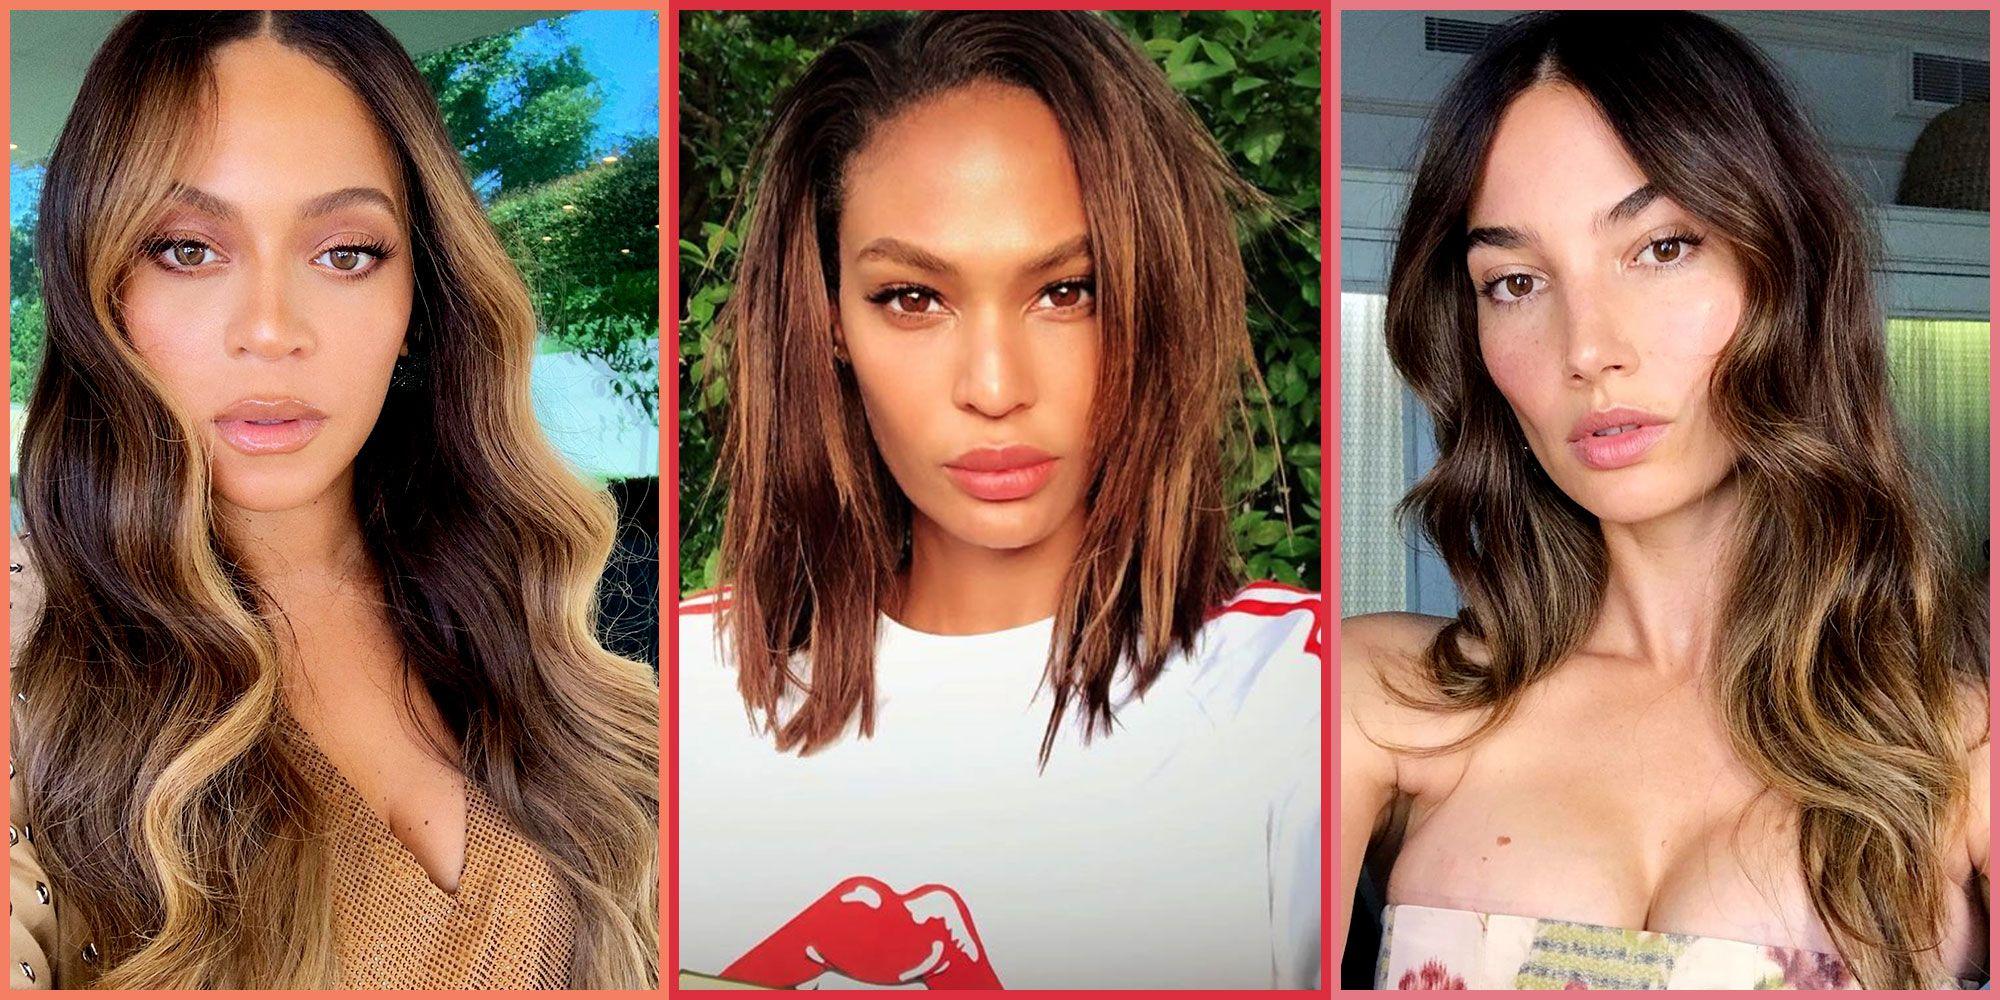 20 Balayage Dark Brown Hair Ideas on Celebrities for 2019